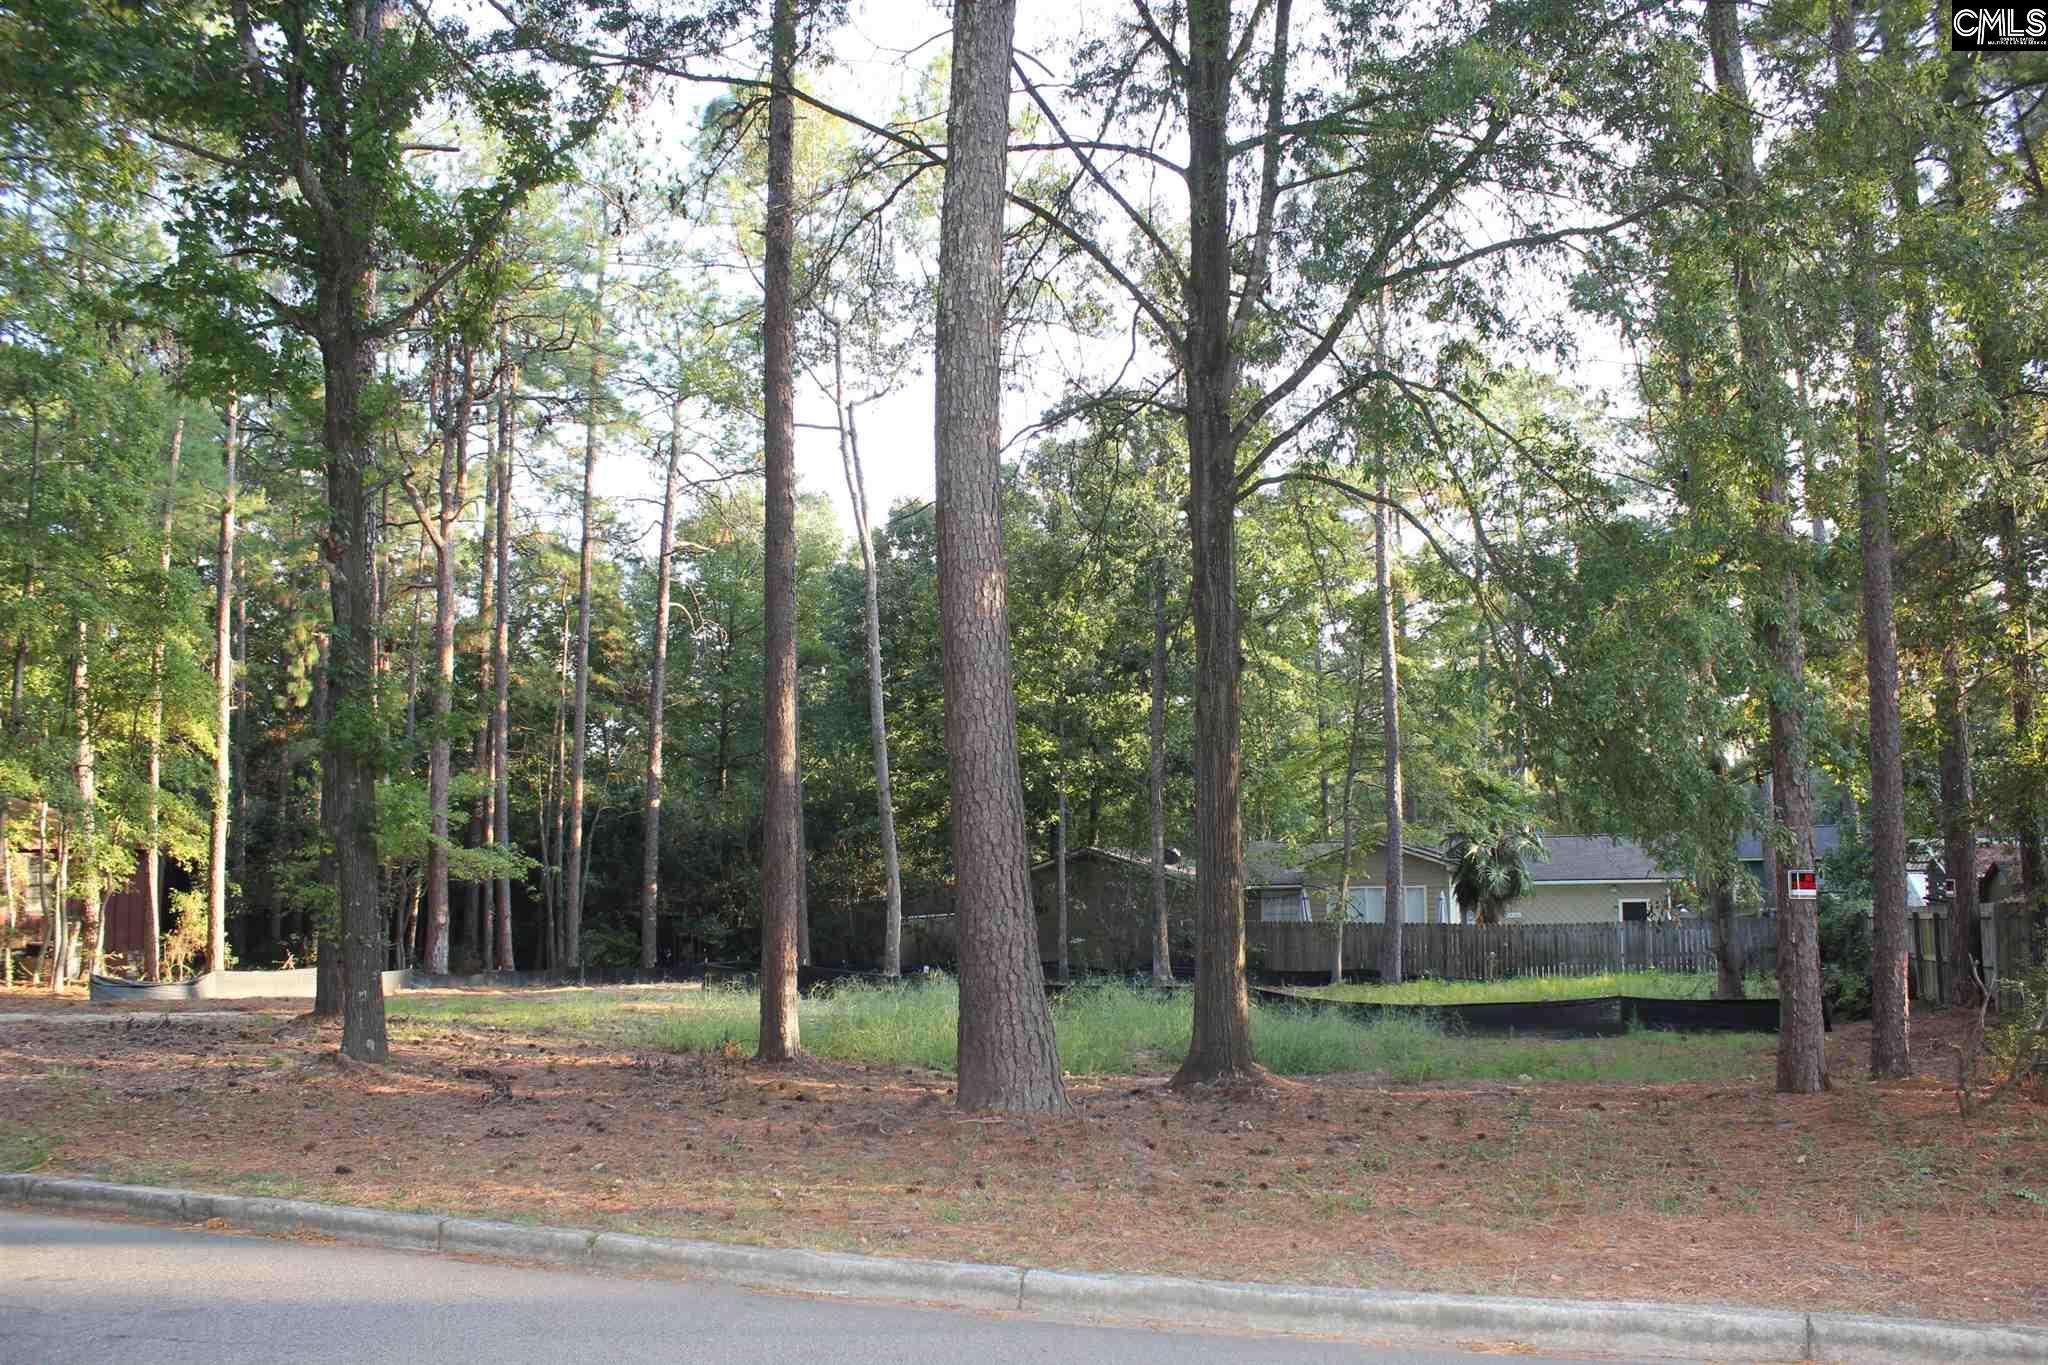 104  Tawny Branch Columbia, SC 29212-3417